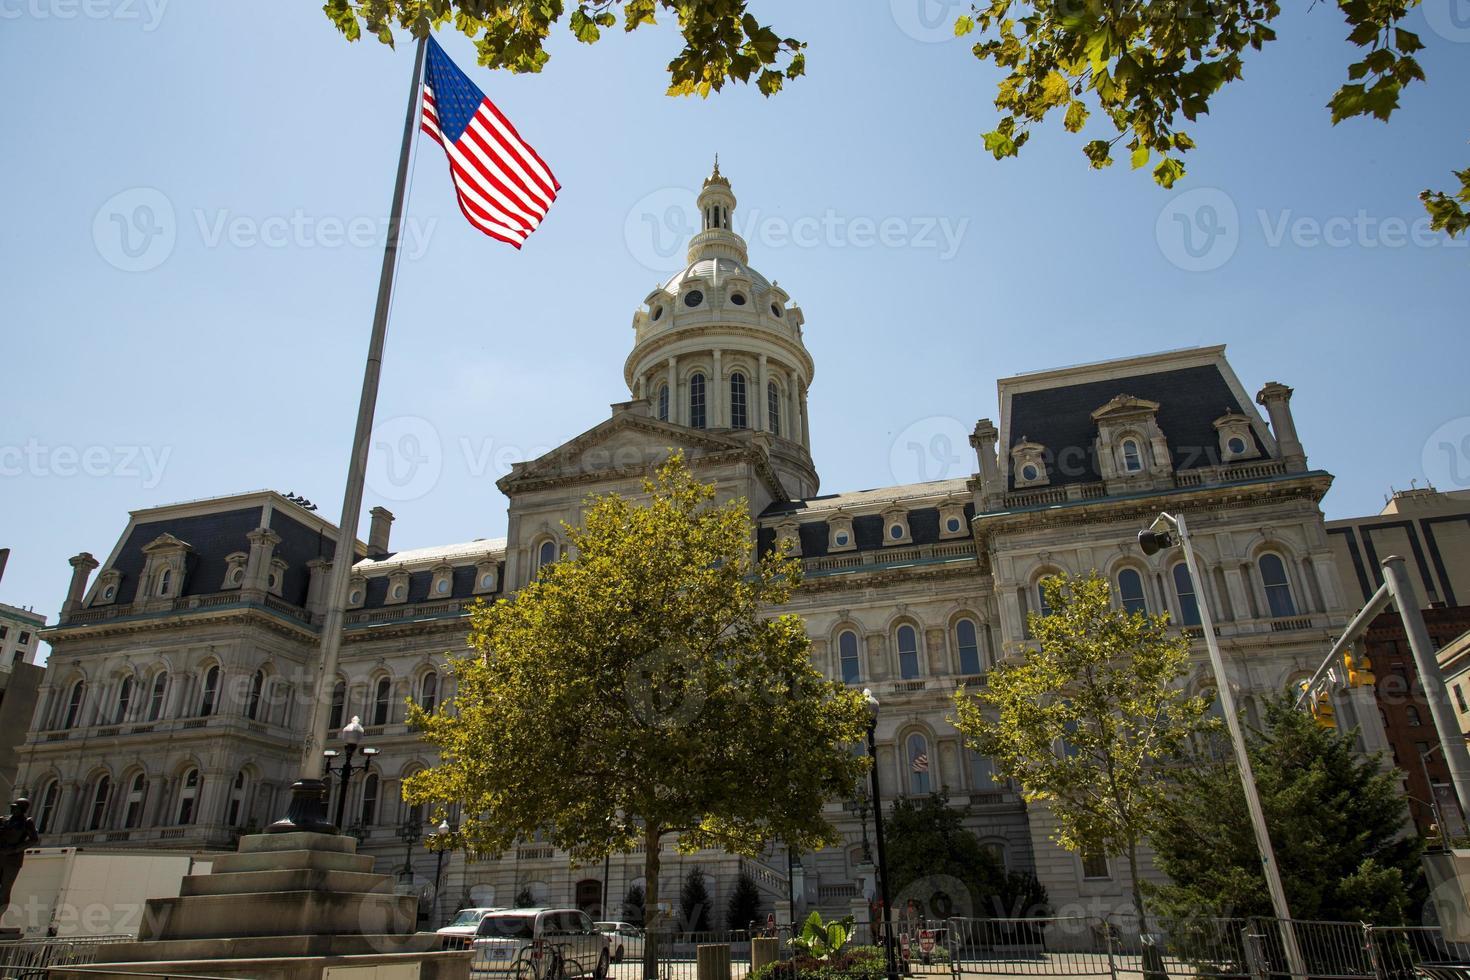 Municipio di Baltimora Maryland foto